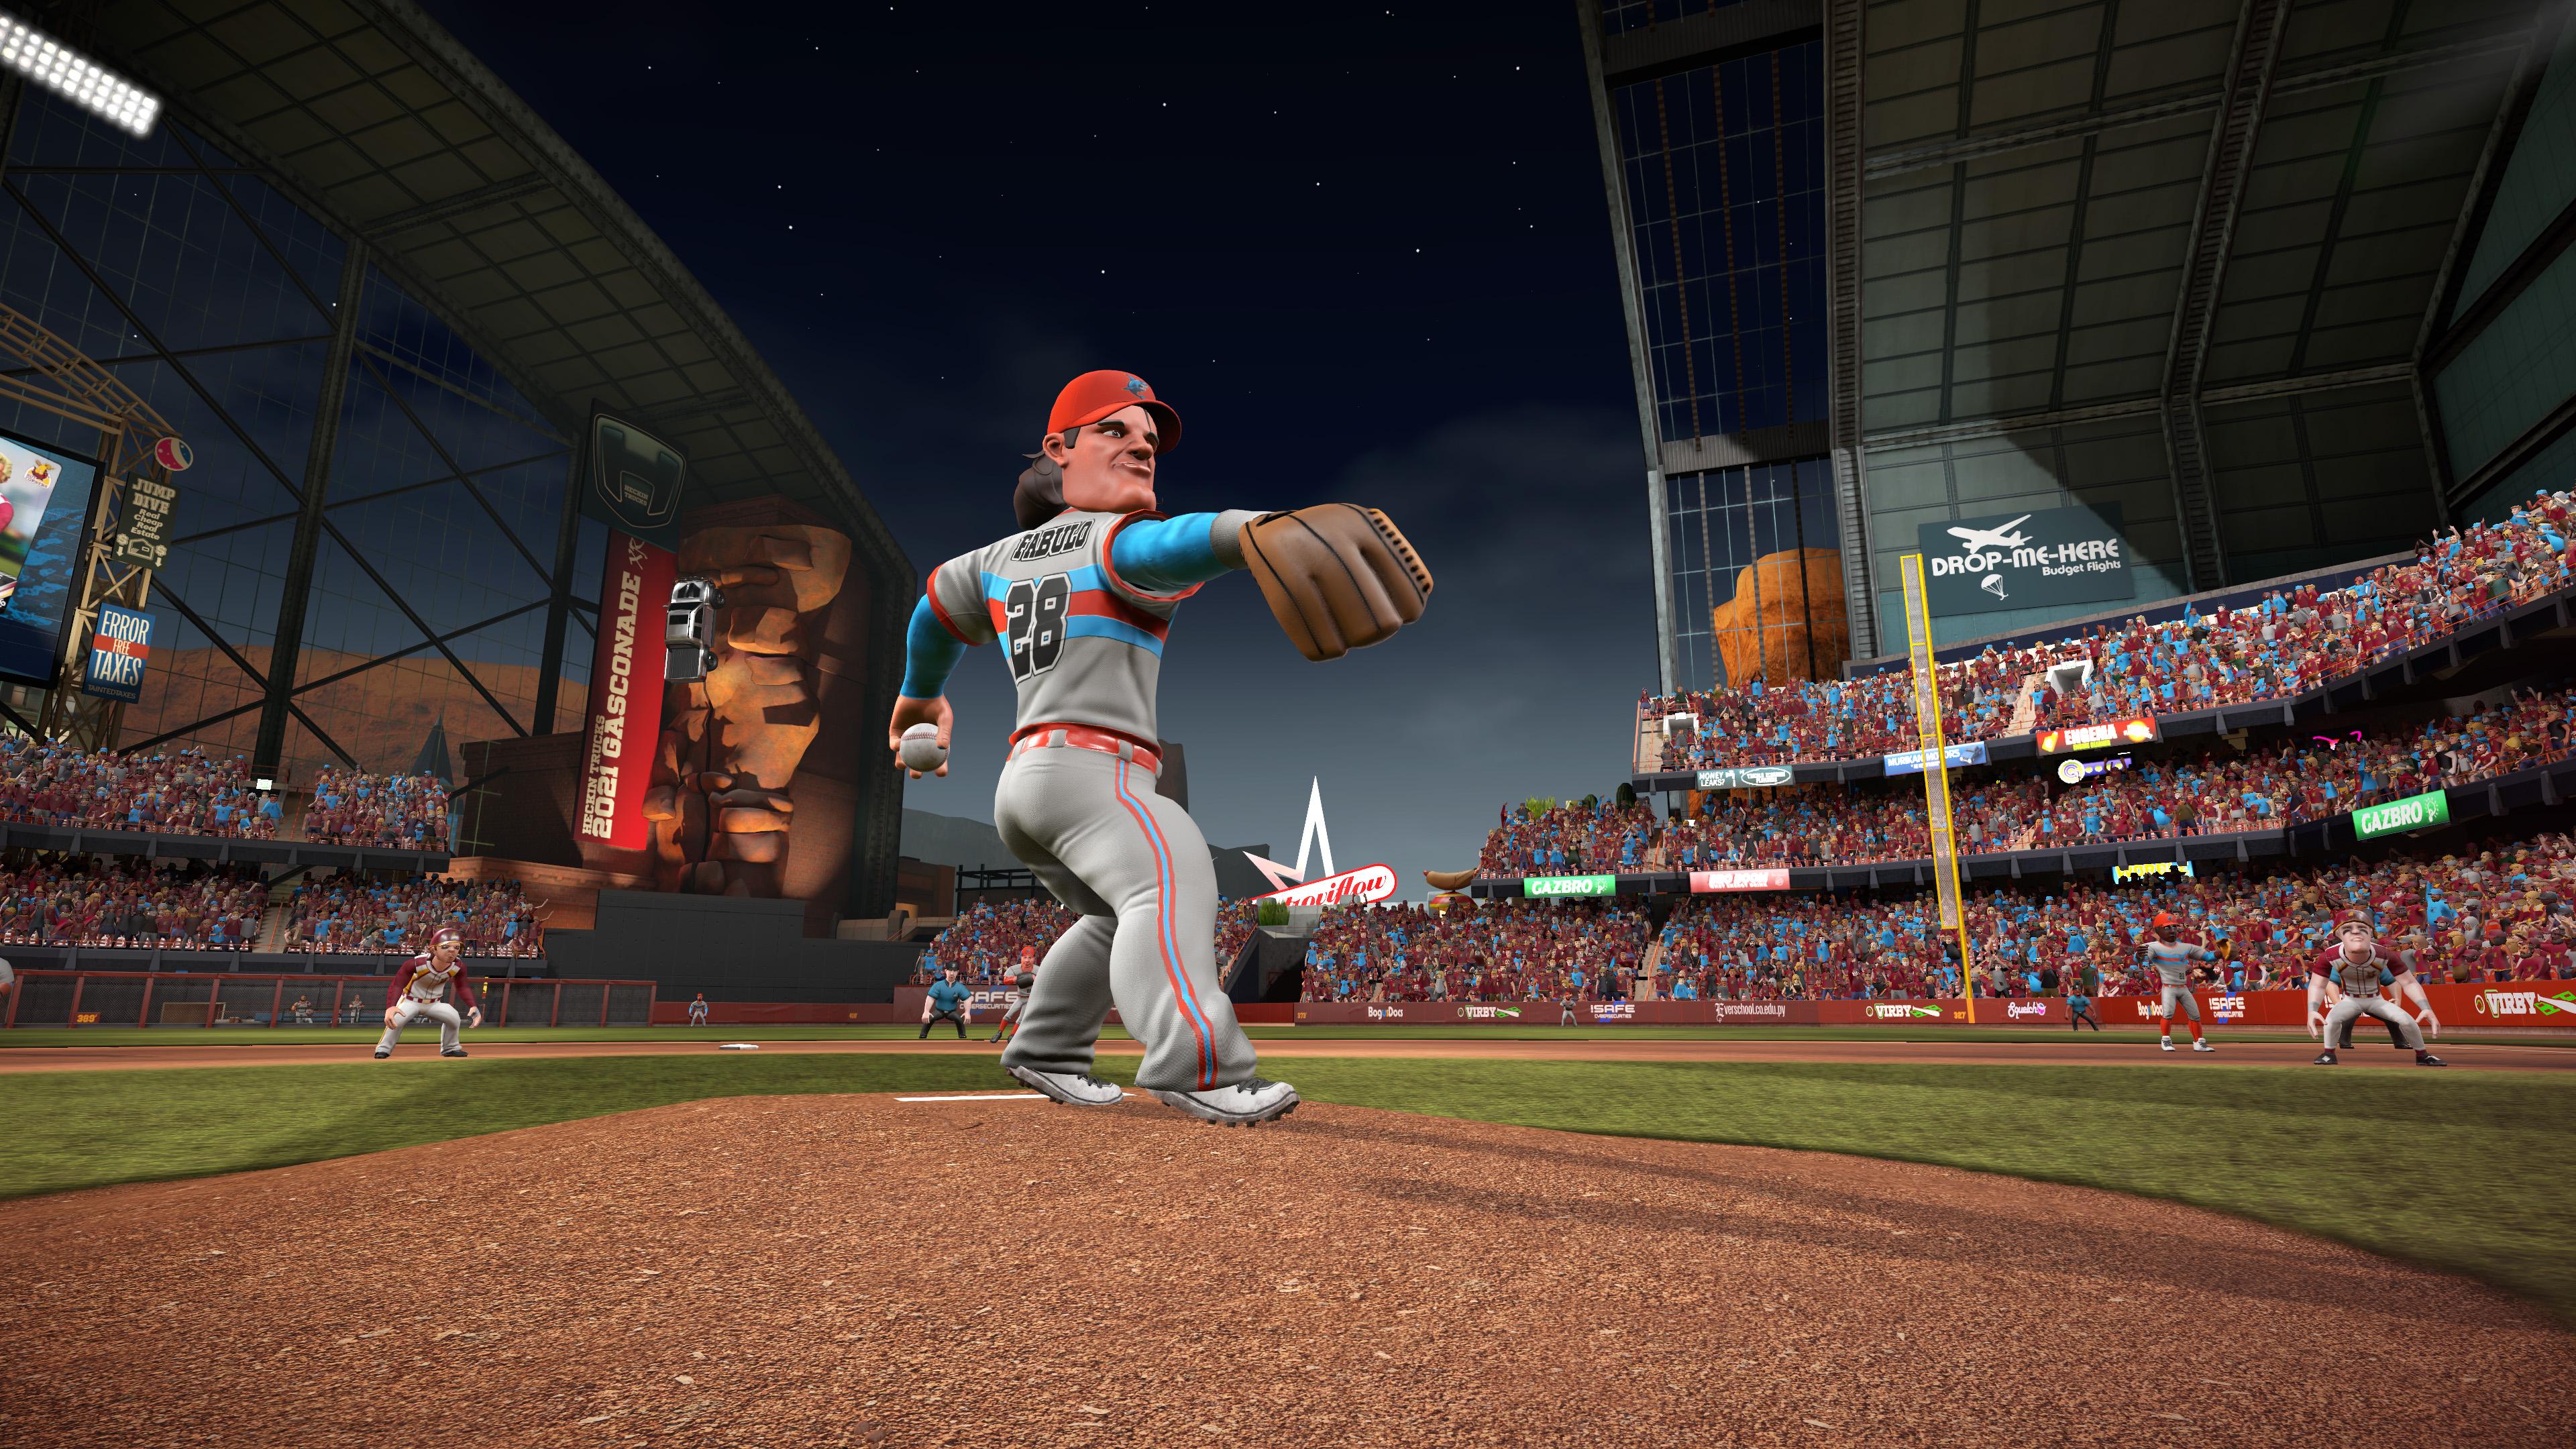 Fabio Fabulo in his windup during a night game in Super Mega Baseball 3